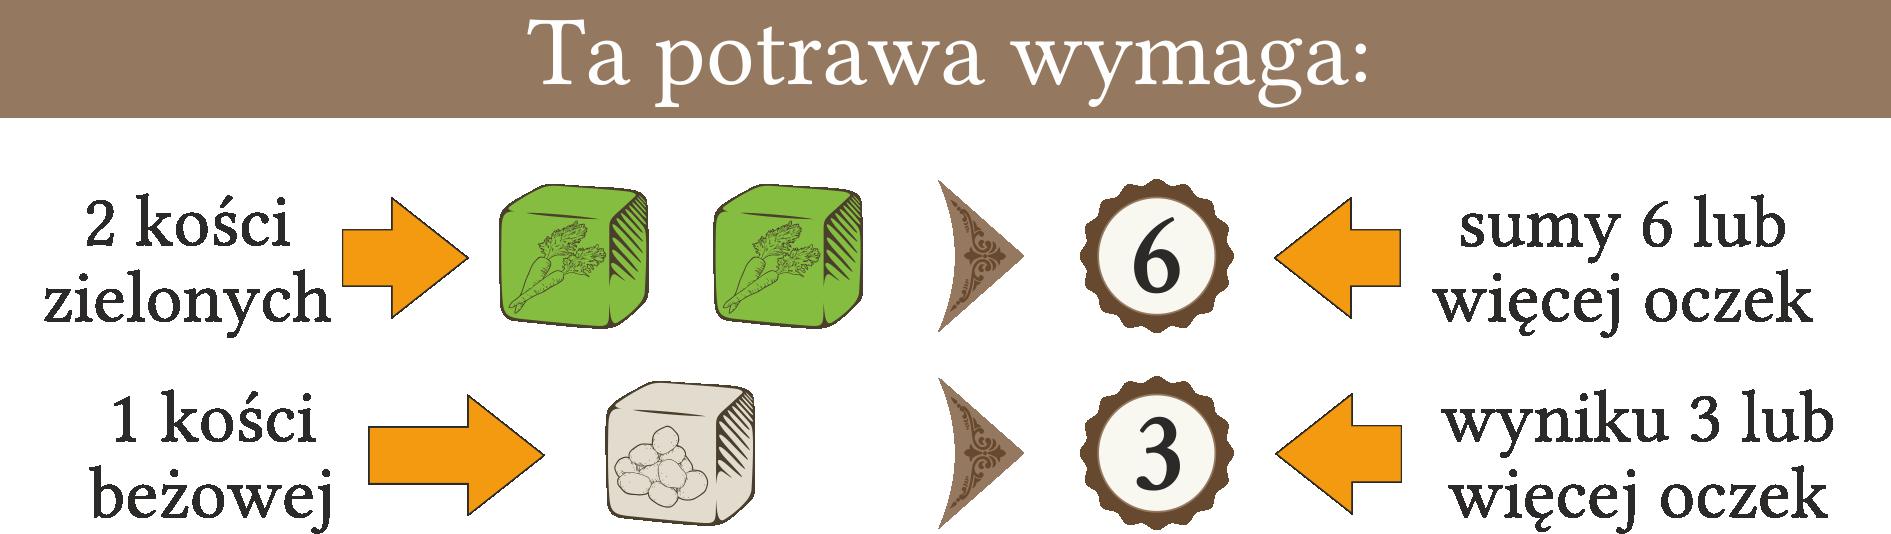 przyklad-menu